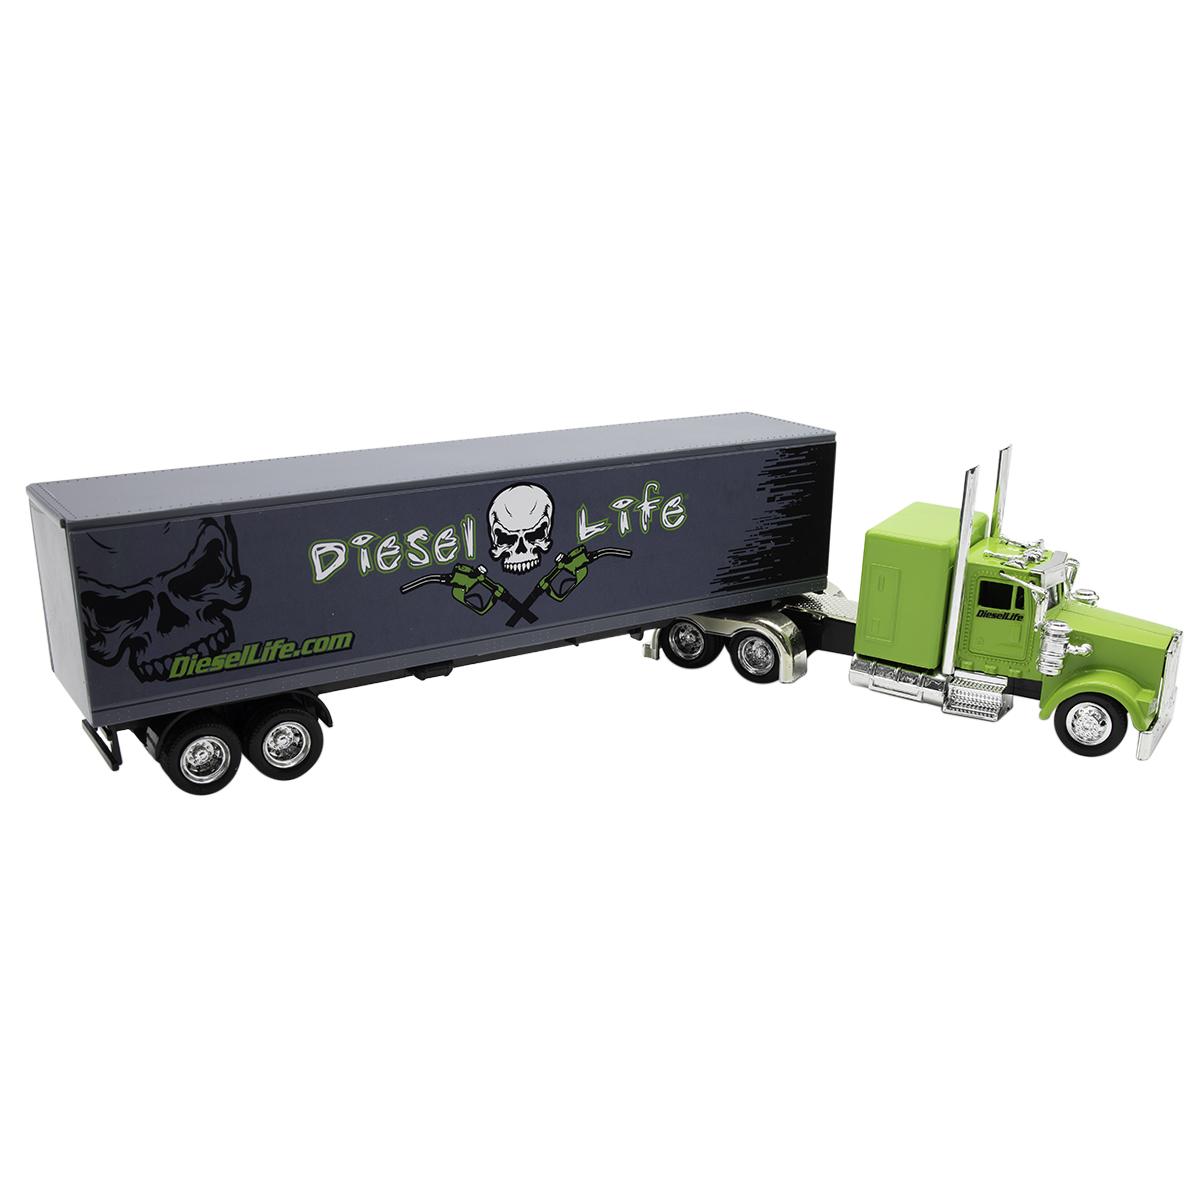 1:43 Scale Die Cast Truck